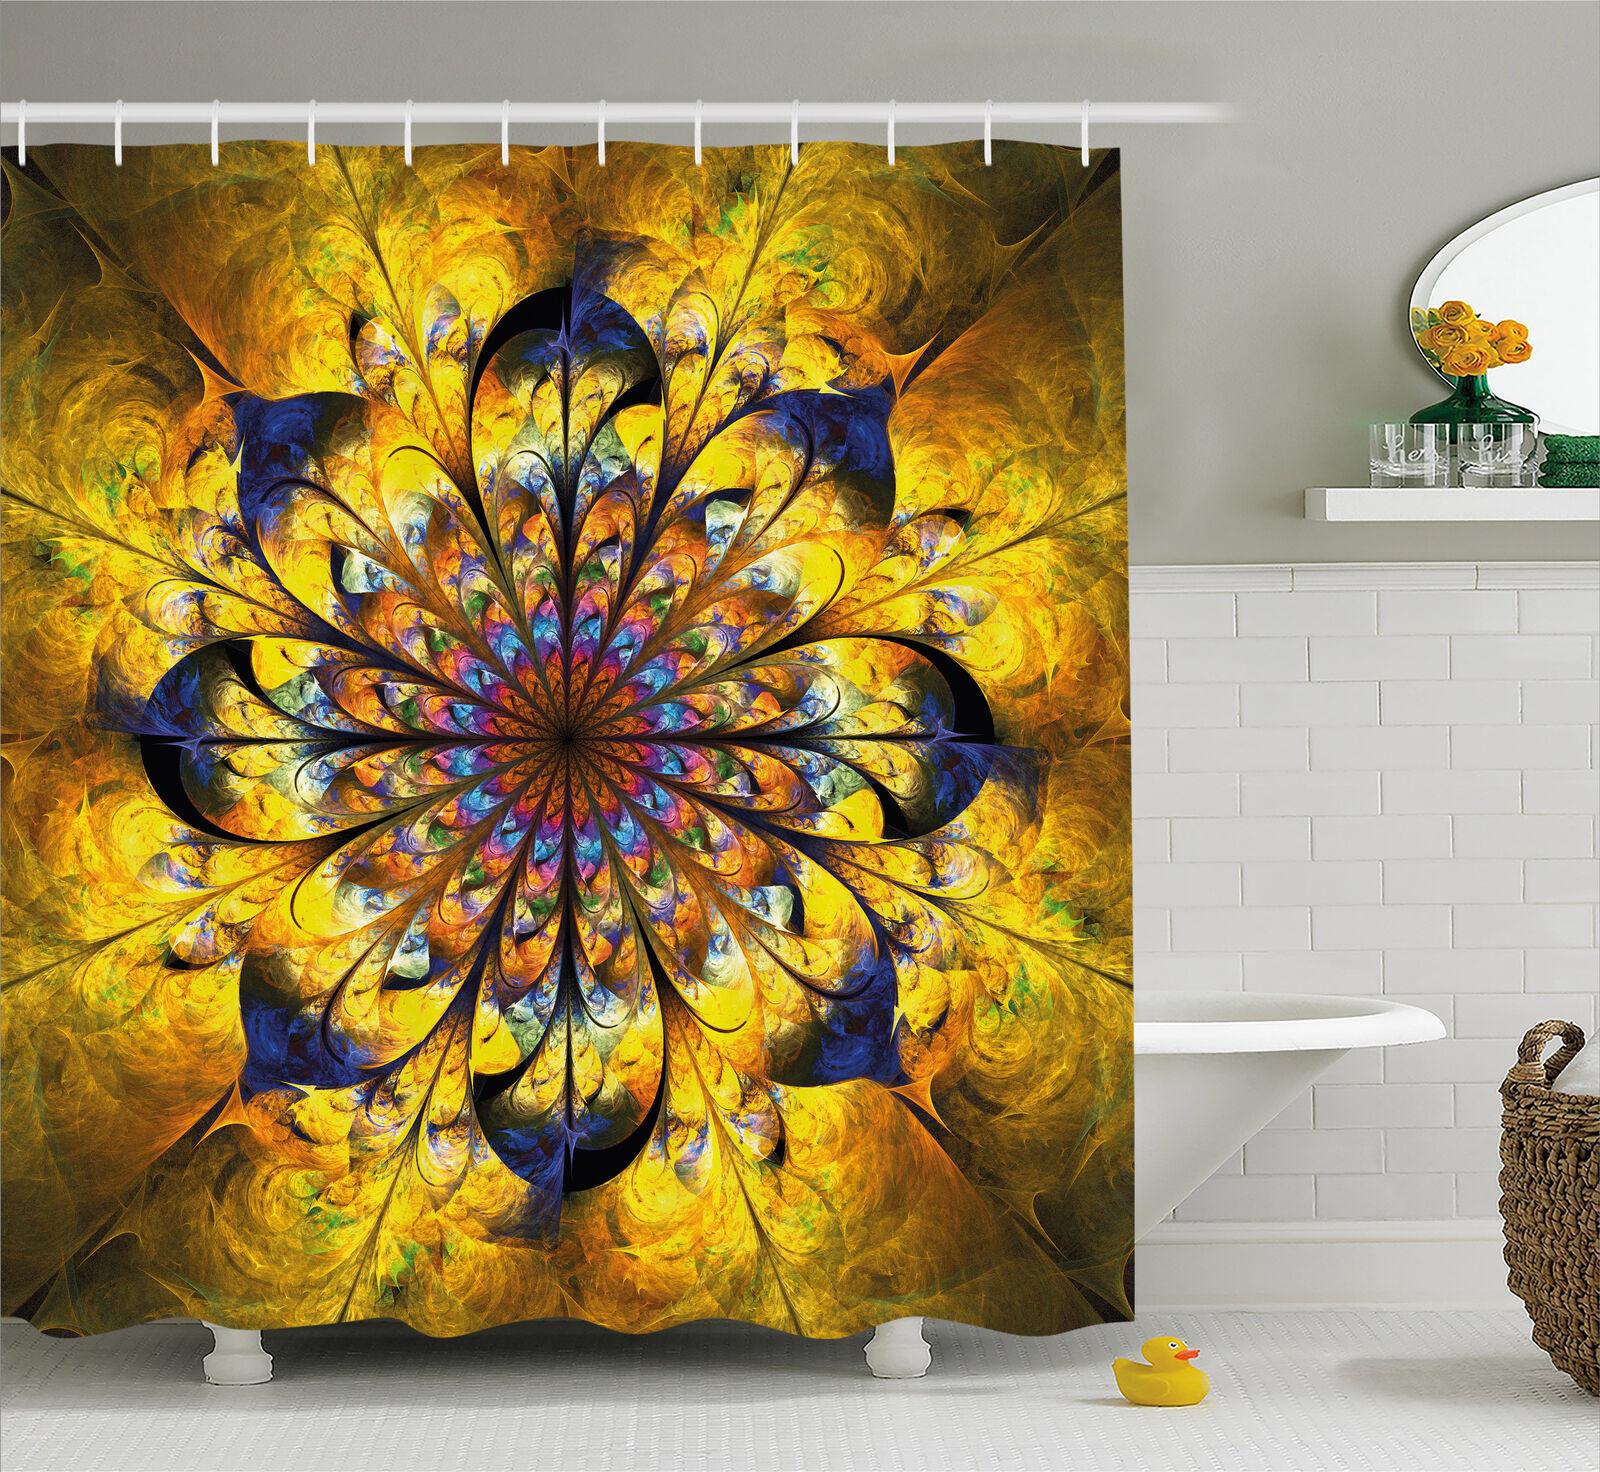 Yellow And Blue Shower Curtain Mandala Boho Art Print For Bathroom 84 Extralong